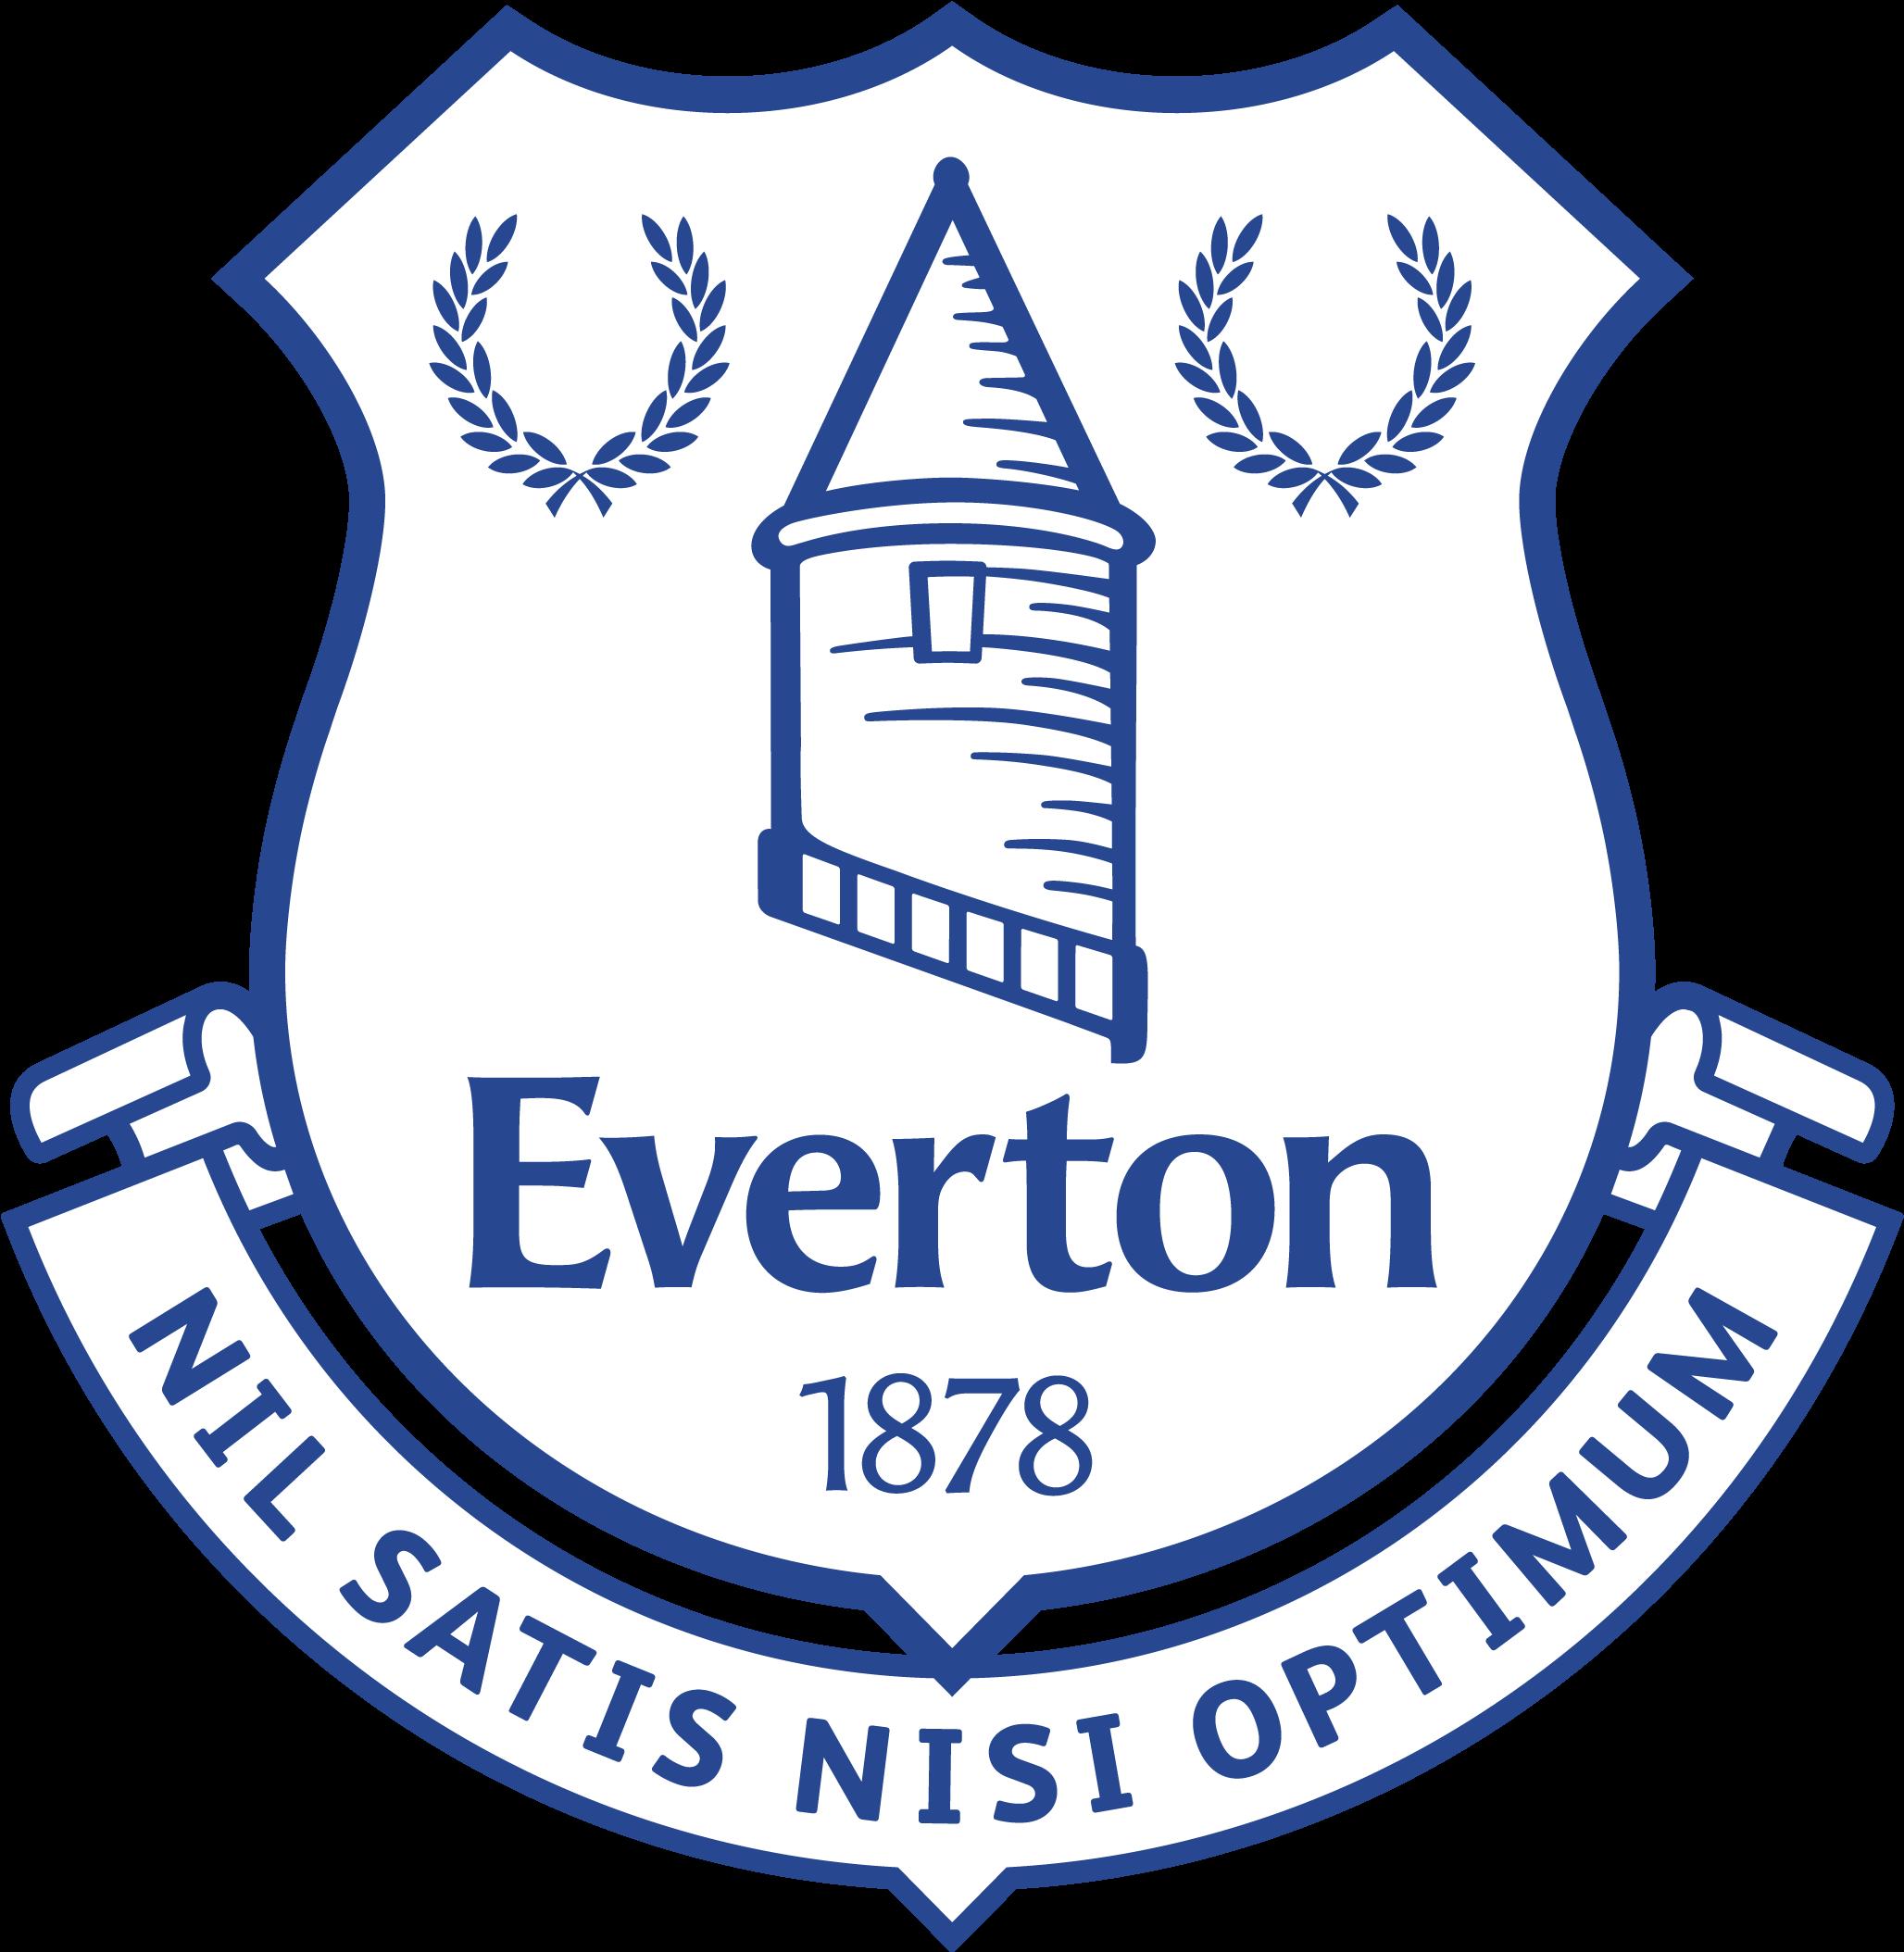 Everton Logo Png Everton Emblem Everton White Logo Png 3777364 Vippng